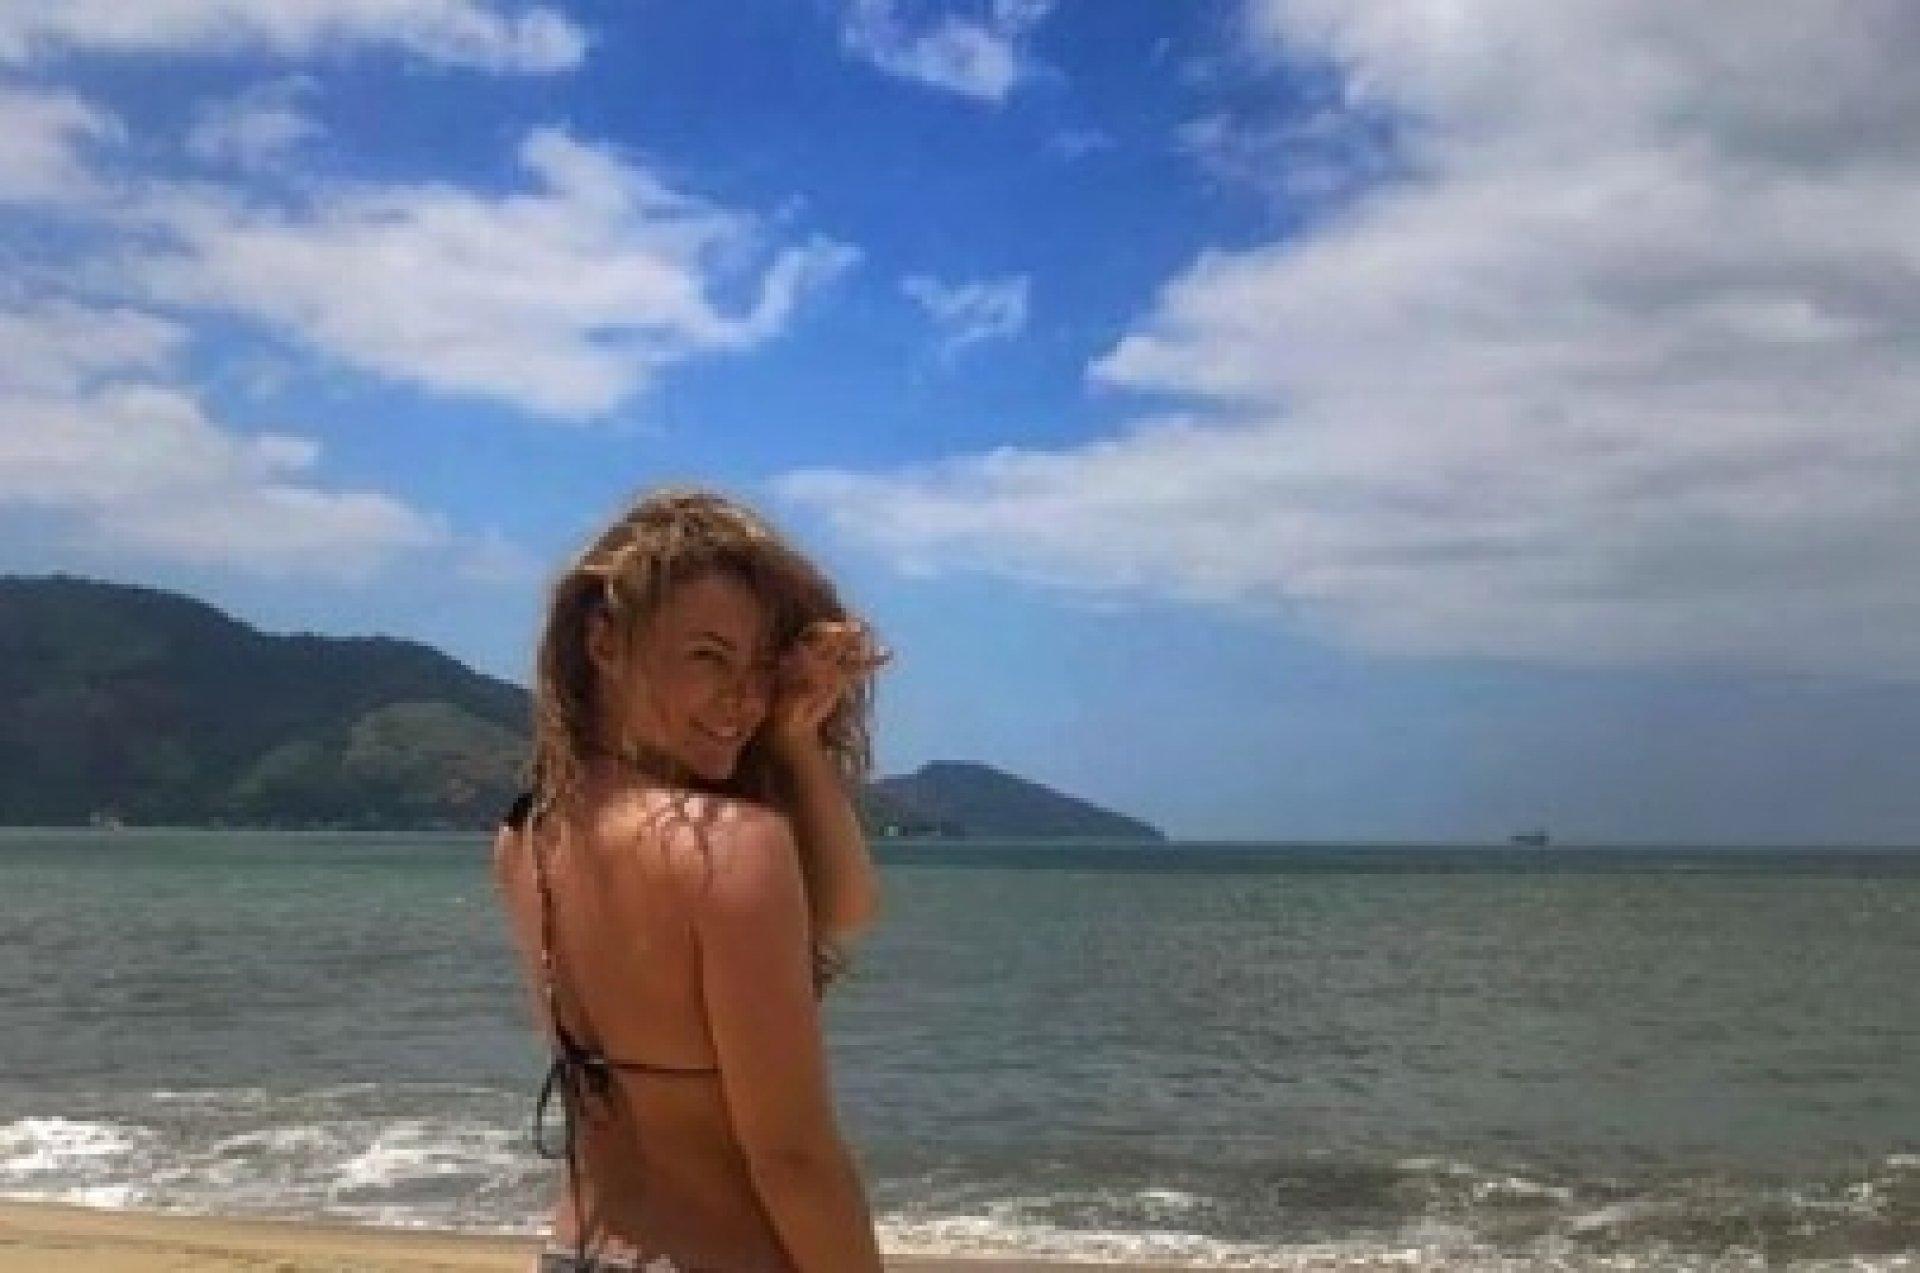 Alinne Moraes Sex paolla oliveira curte praia só de fio dental. veja fotos mh